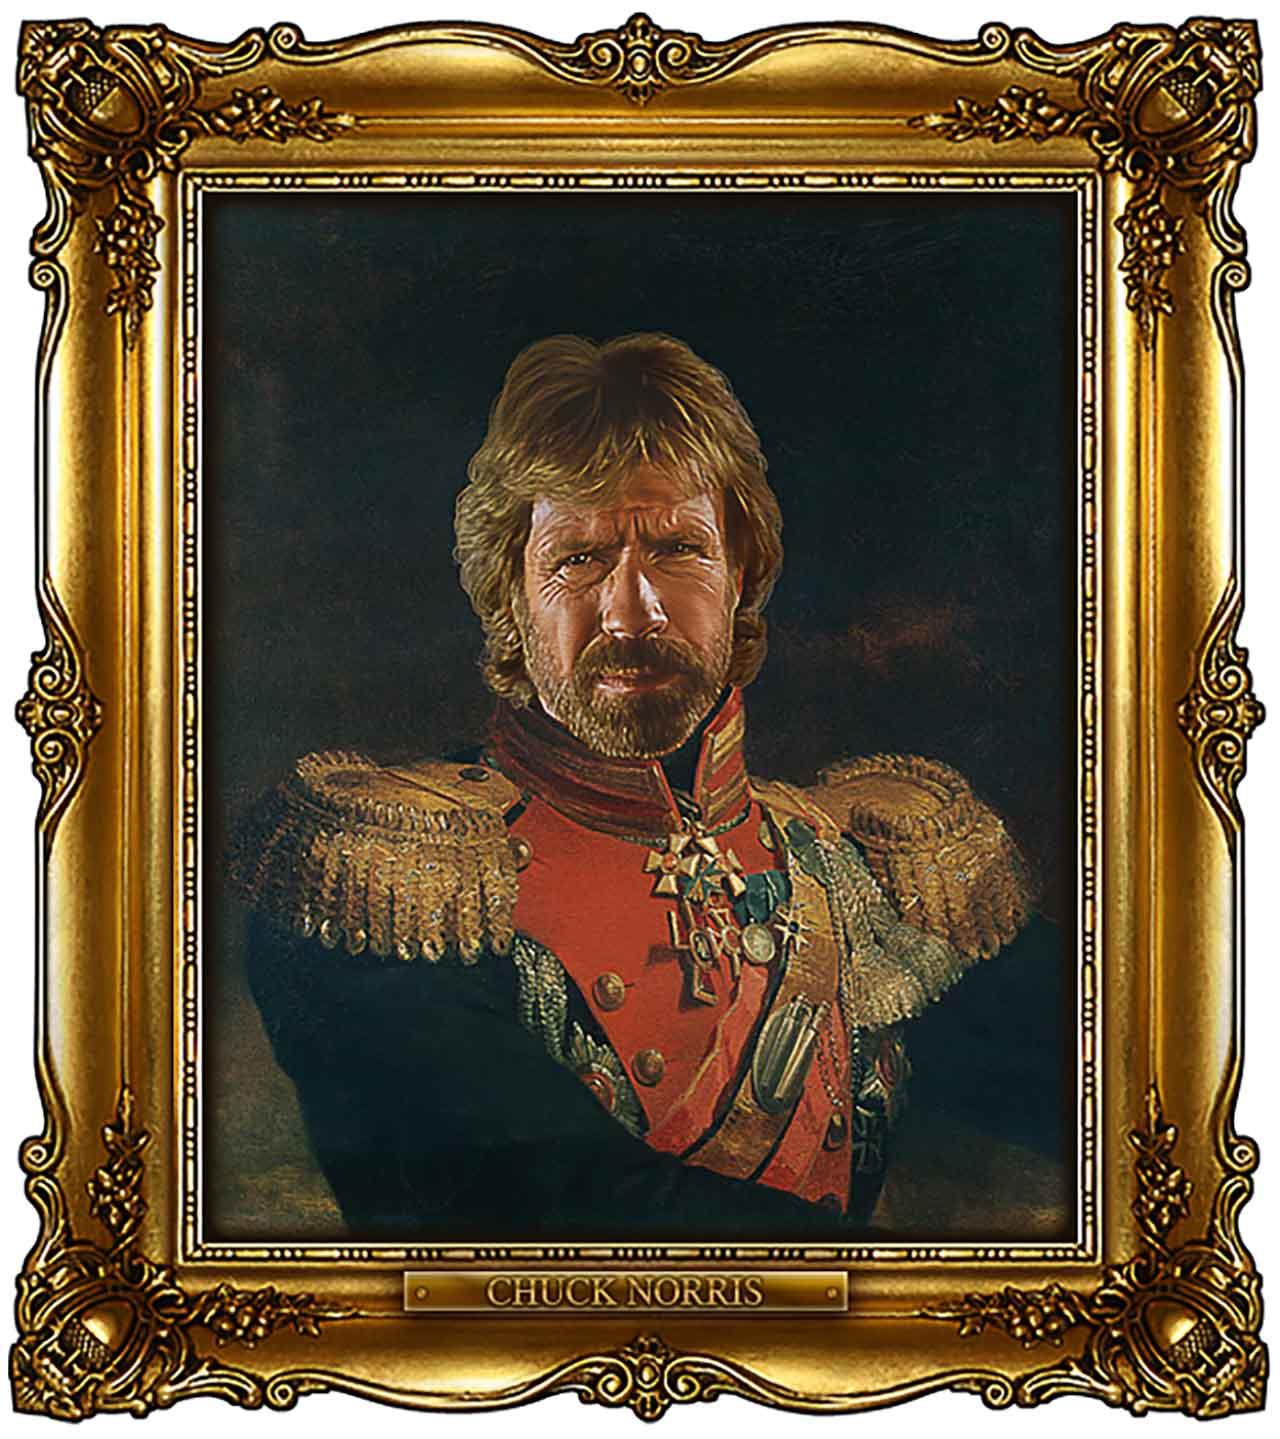 Artist Turns Famous Actors Into Russian Generals - Chuck Norris